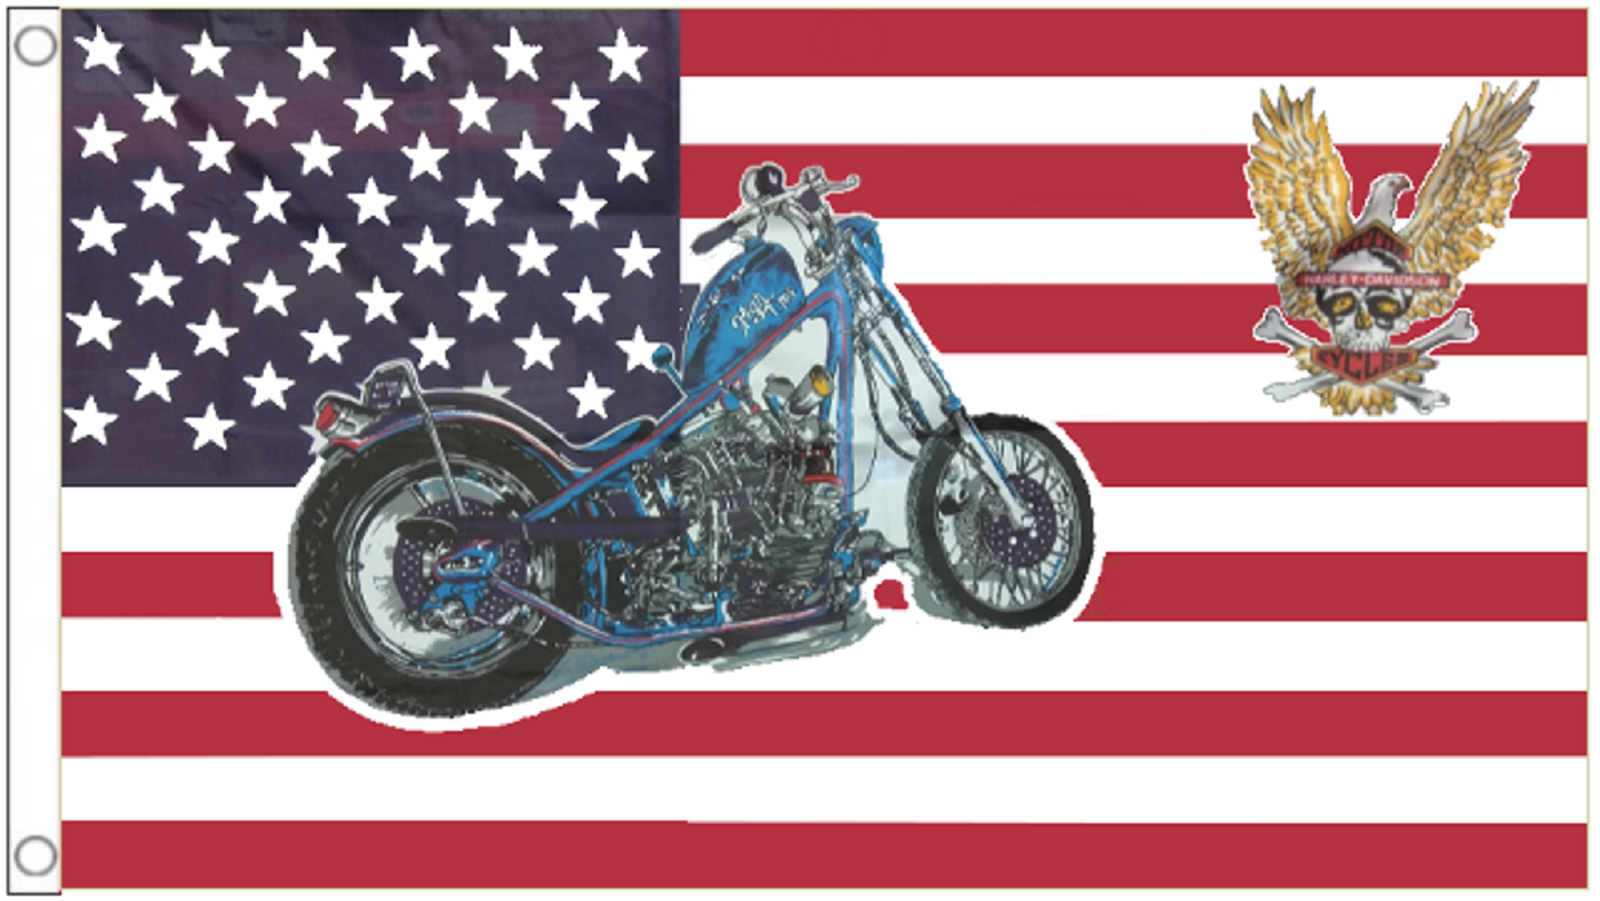 Moto et aigle États-Unis OF OF OF AMERICA ETATS-UNIS 5' x 3' DRAPEAU db0fdb